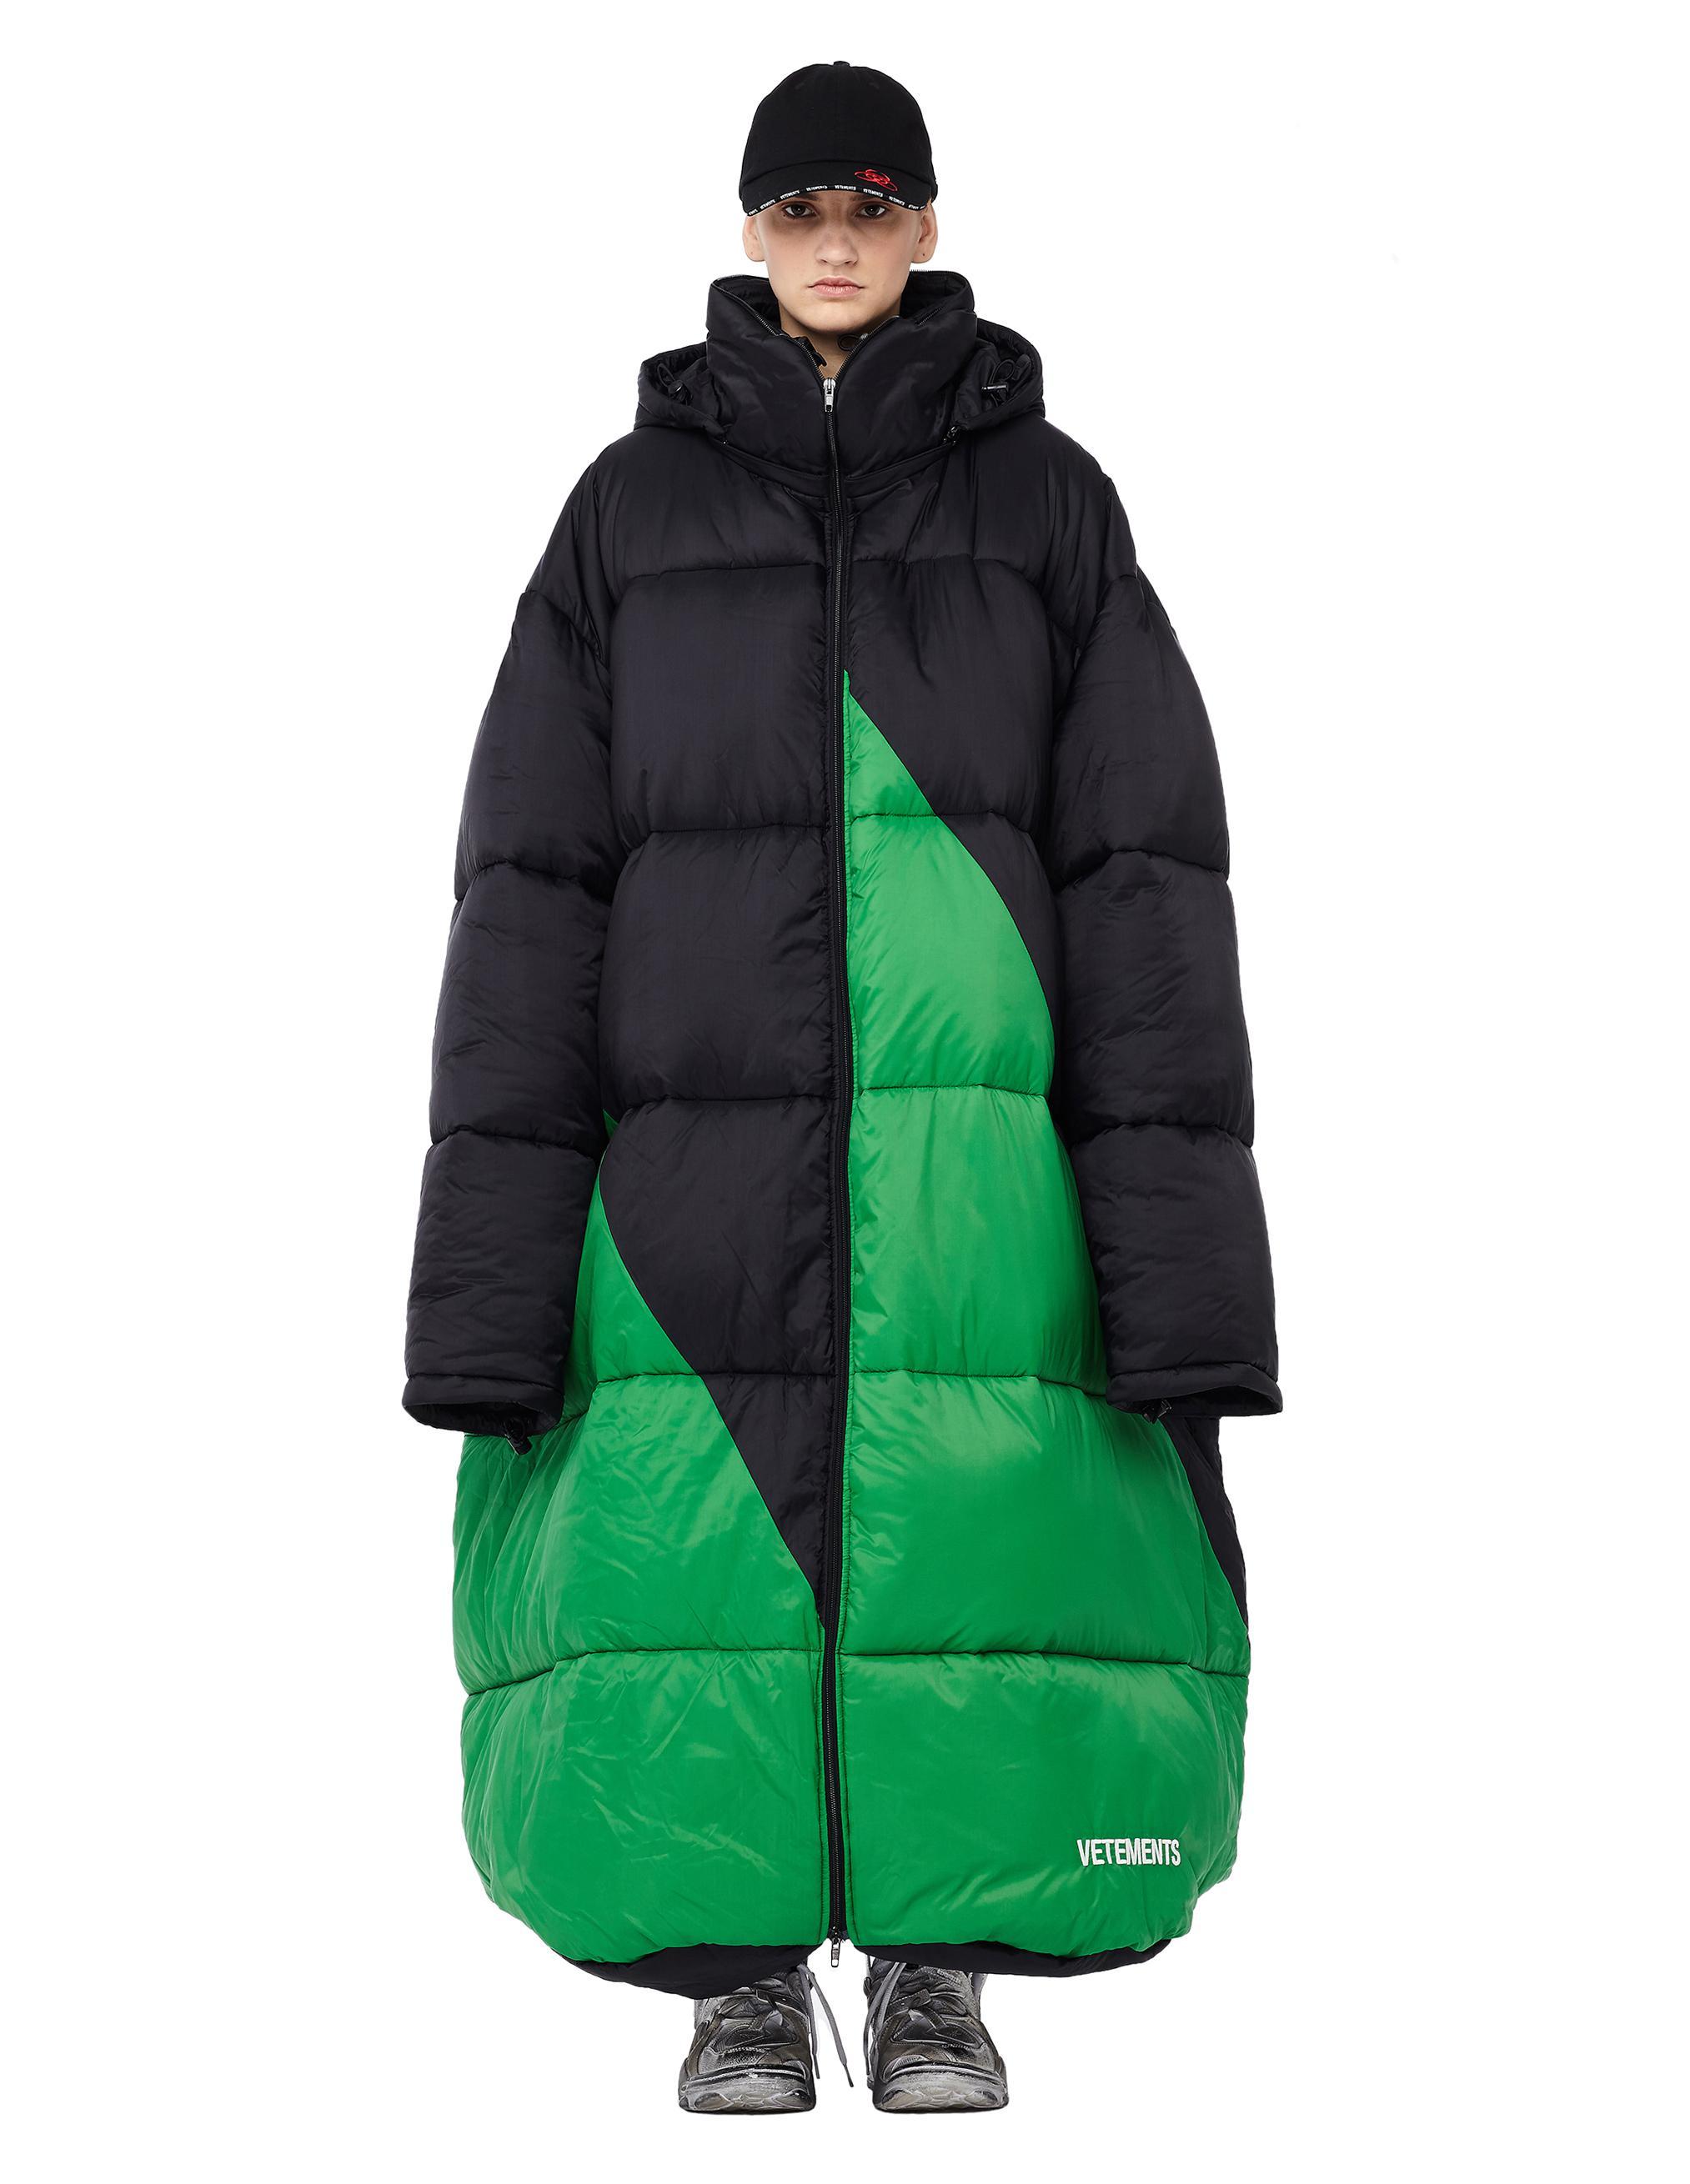 Kozzen's Gear Vetements-Black-Vagabond-Sleeping-Bag-Oversized-Puffer-Jacket